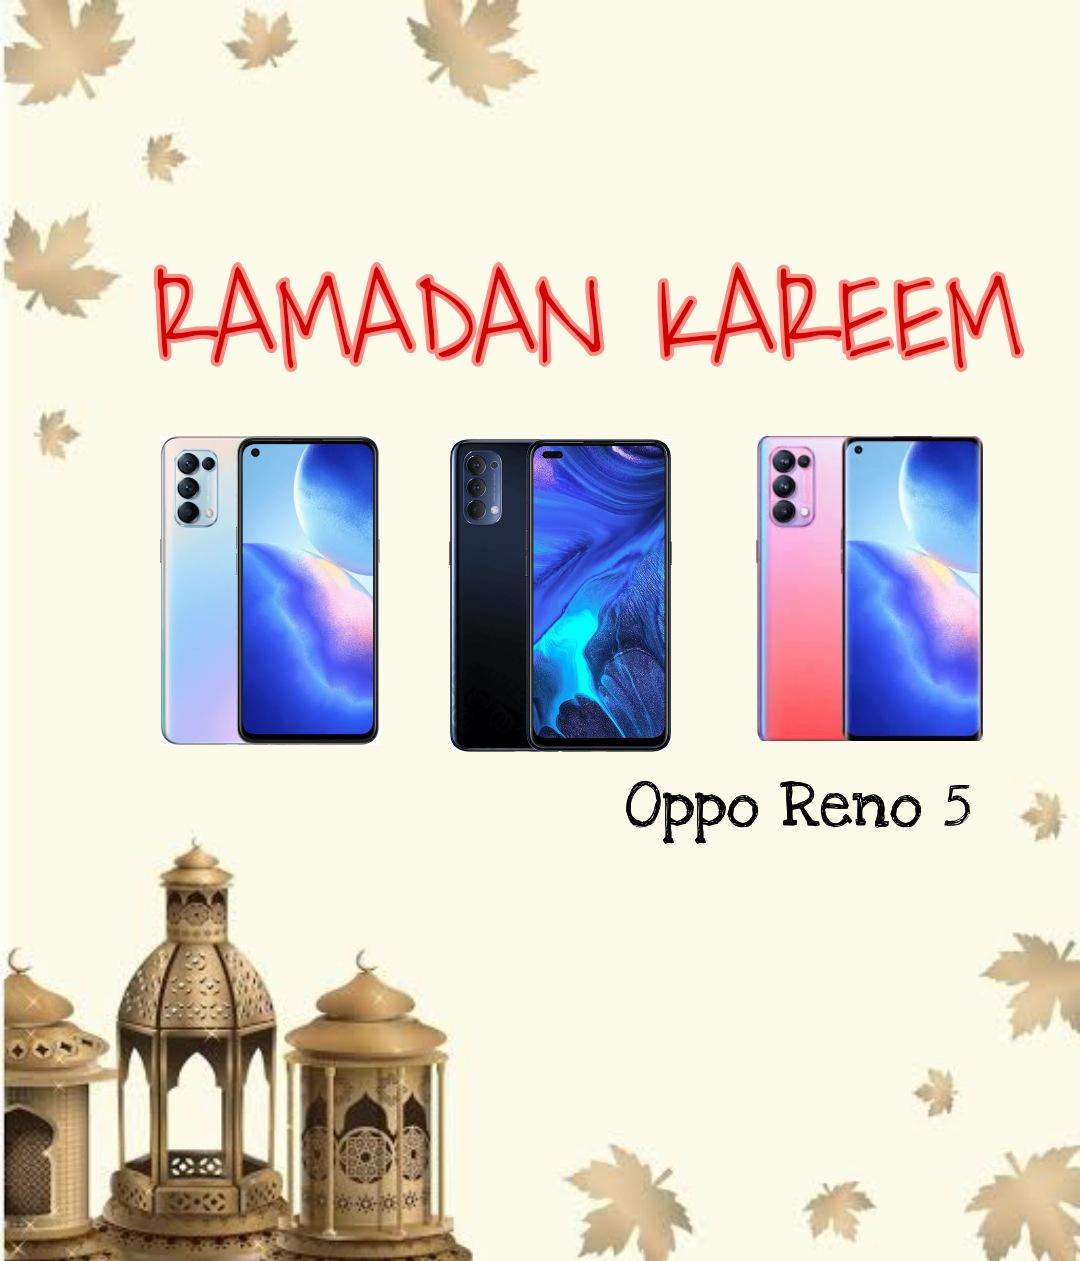 Oppo Reno 5, Bikin Kontenmu Jadi Lebih Baik di Bulan Ramadan